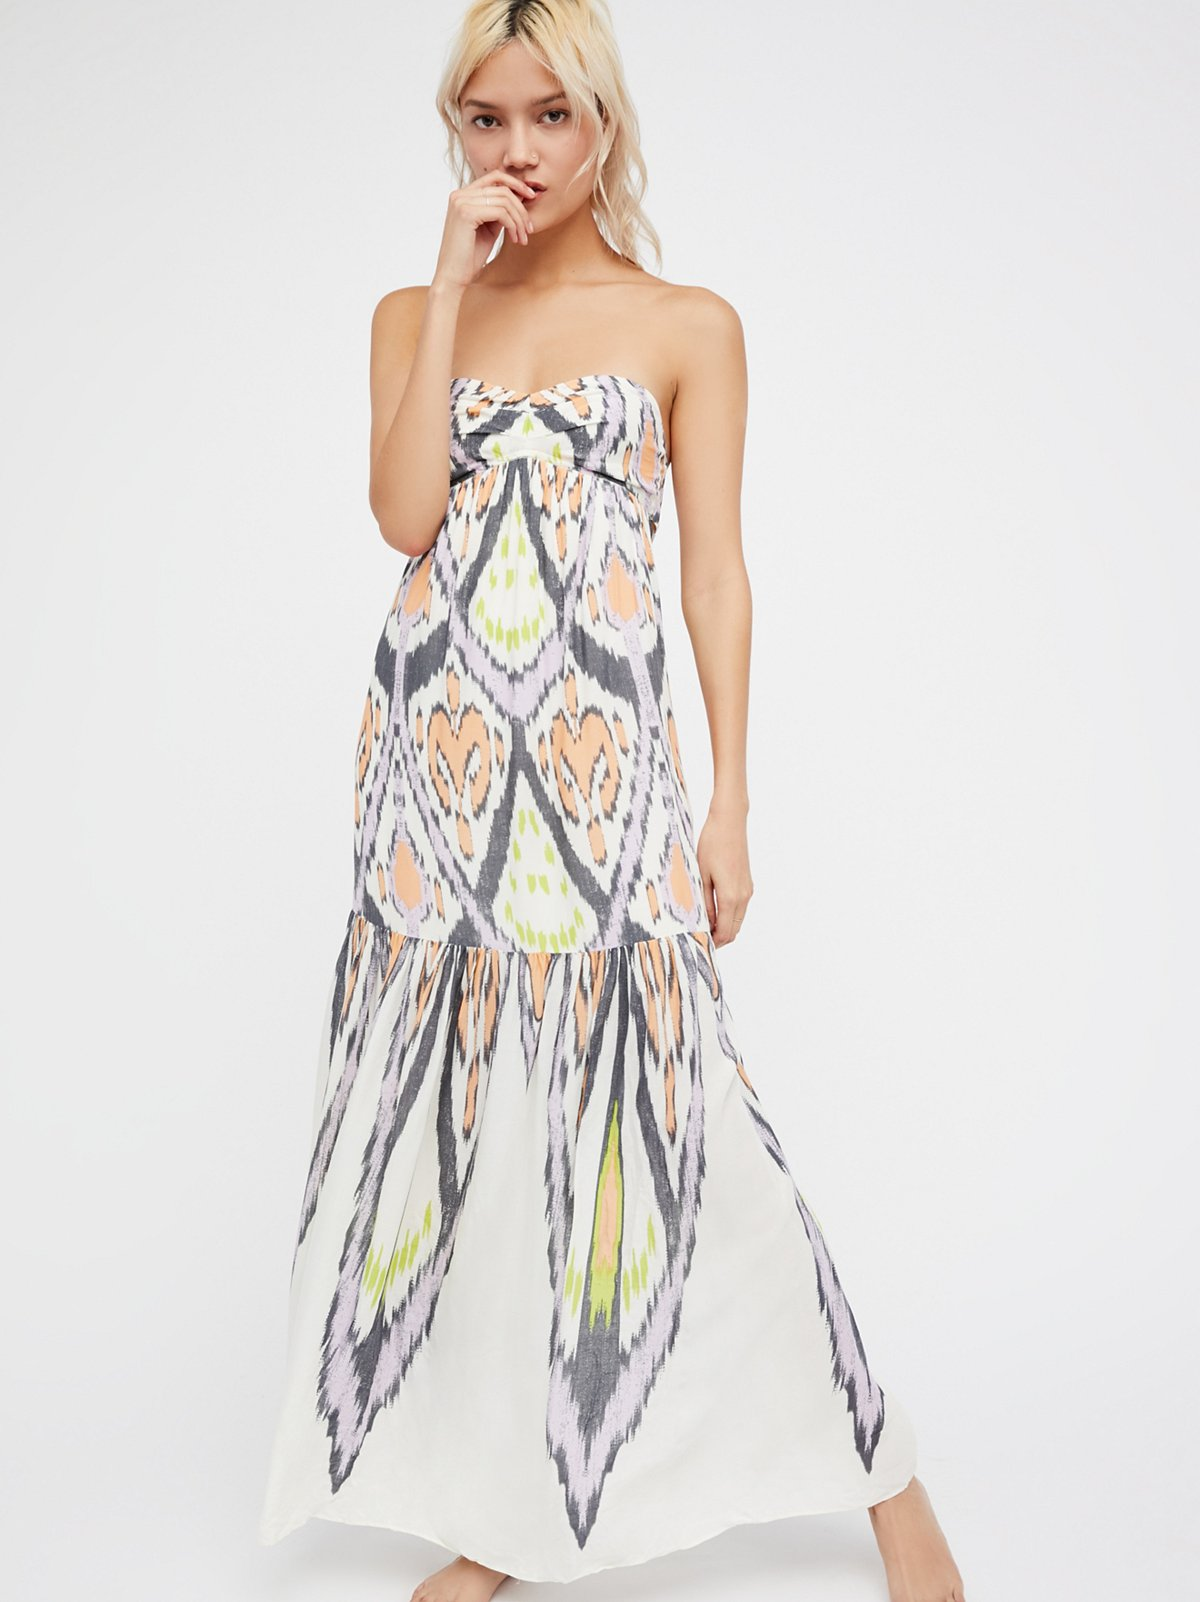 Mojave Maxi Dress